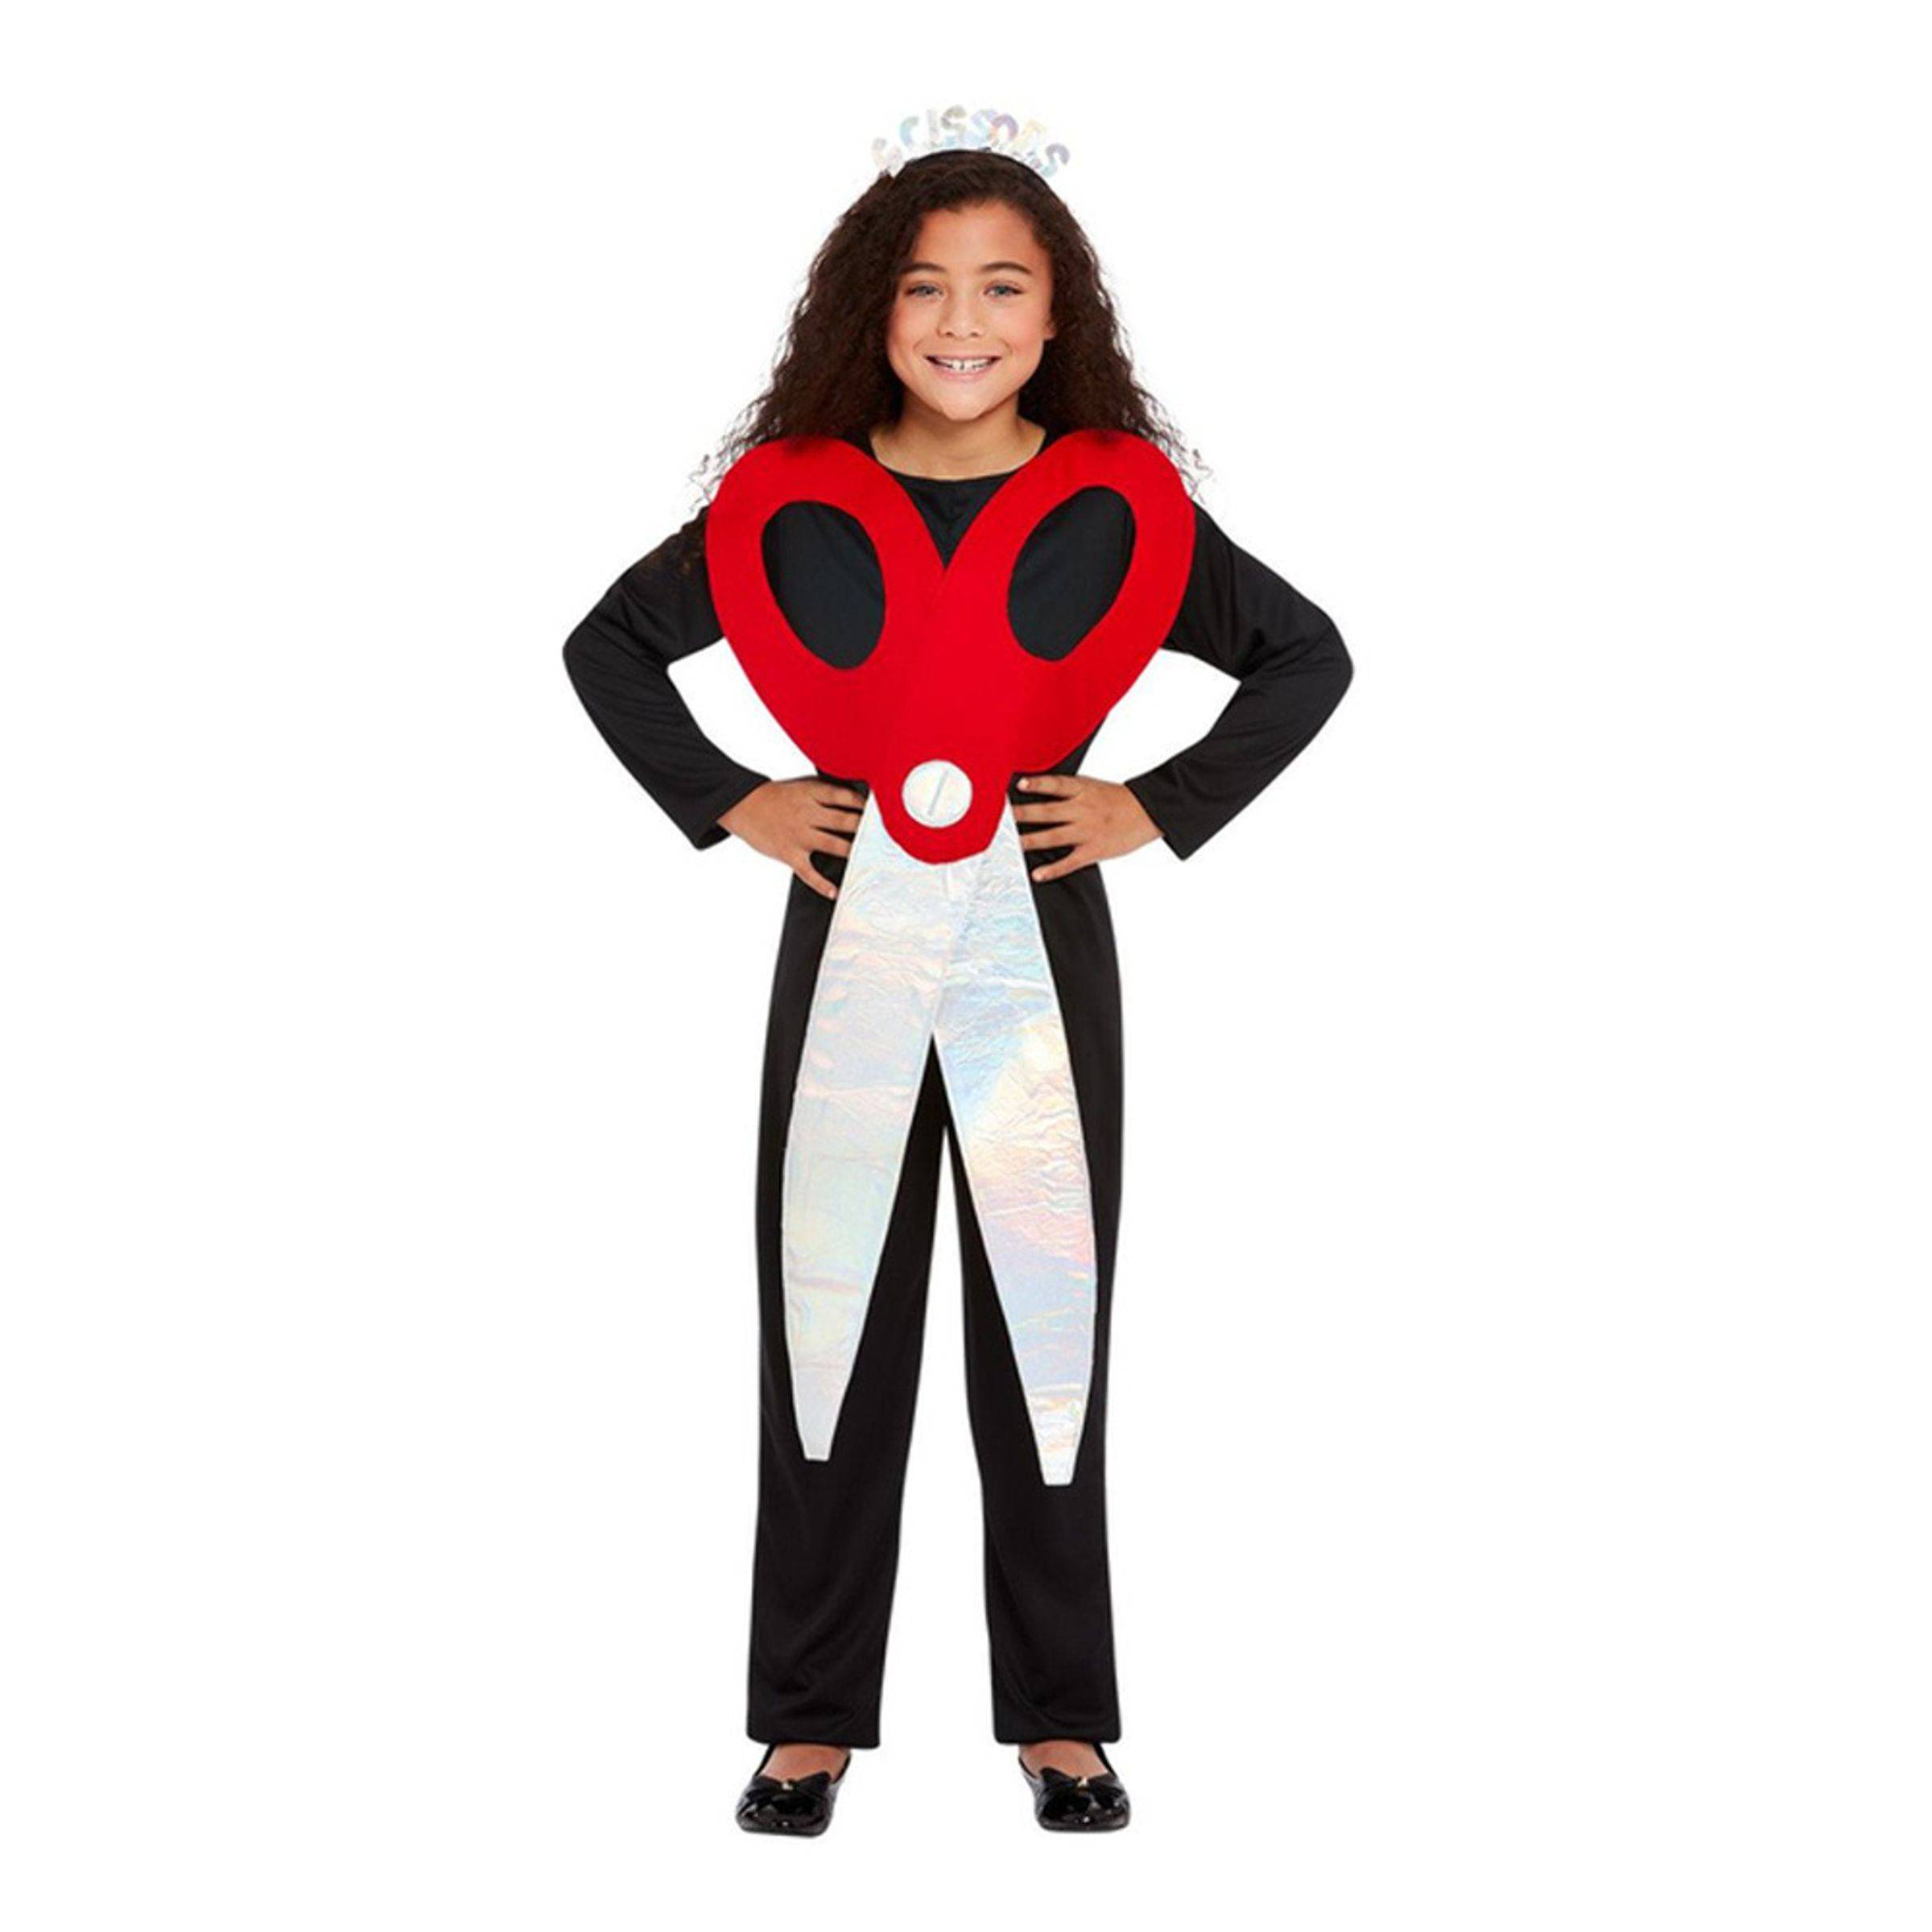 Saks Barn Kostyme - Small/Medium